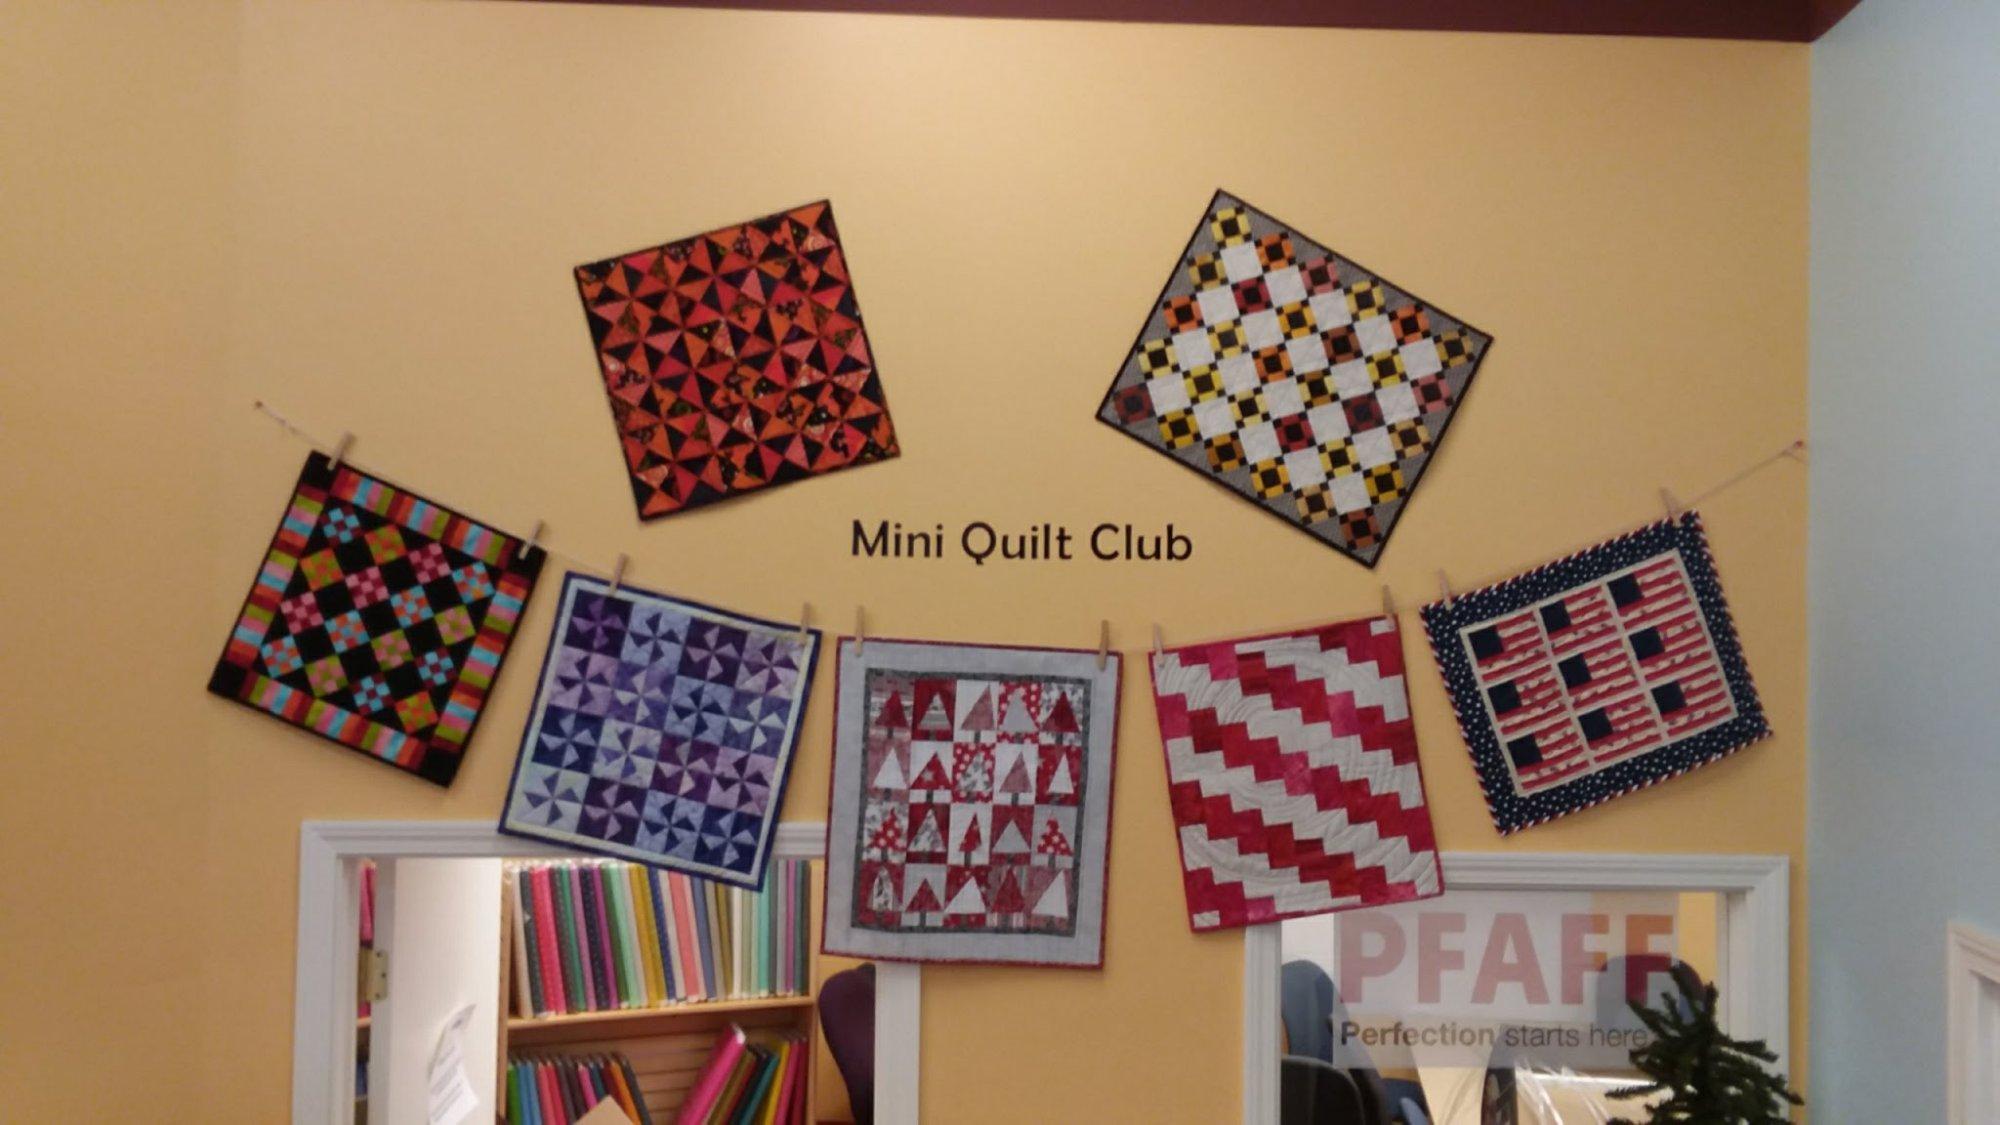 Miniature Quilt Club : quilt club - Adamdwight.com